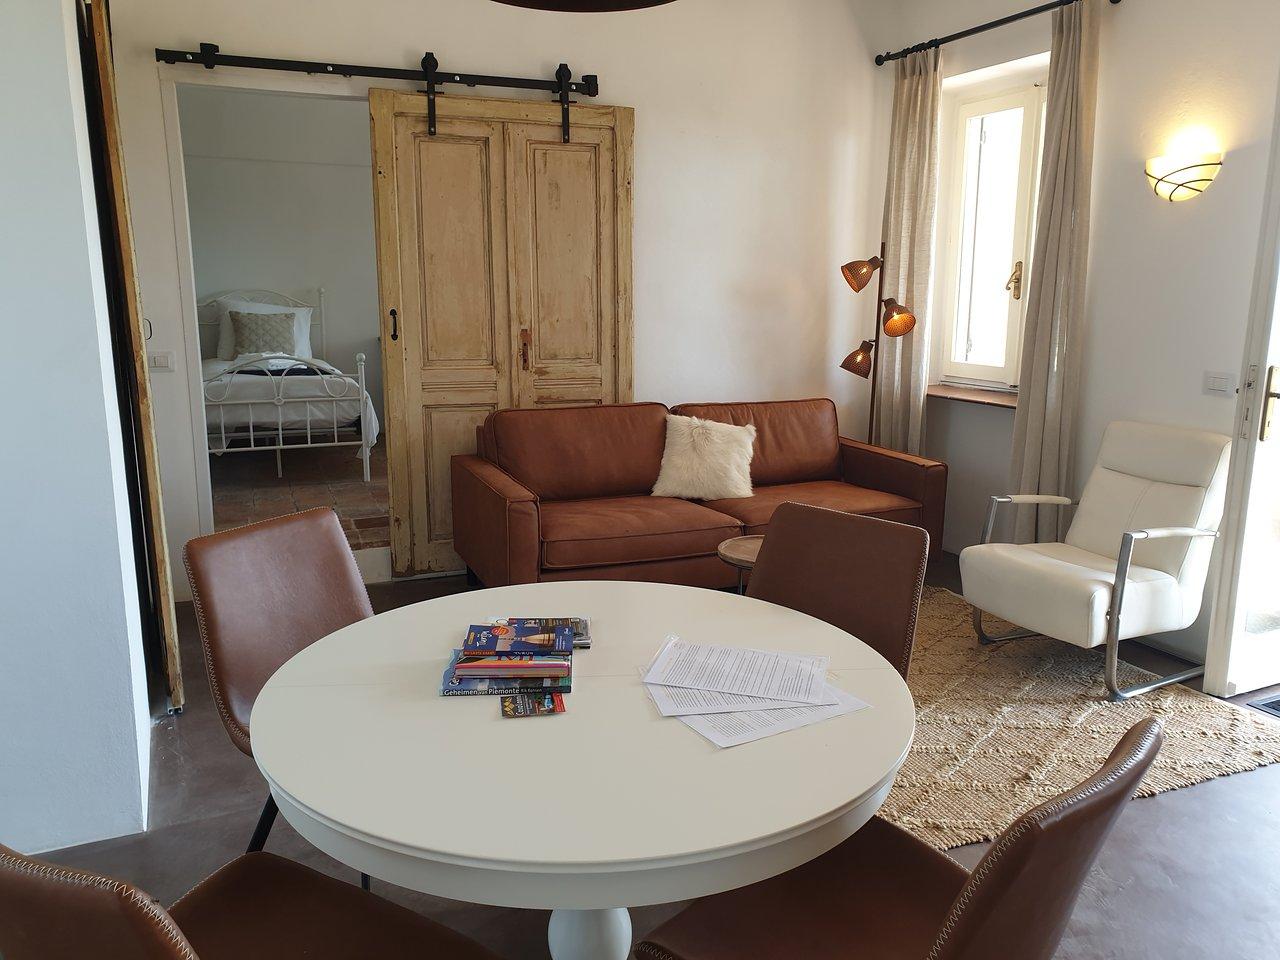 Eetkamer Van Chris.Casa Lanni Prices Lodging Reviews Clavesana Italy Tripadvisor